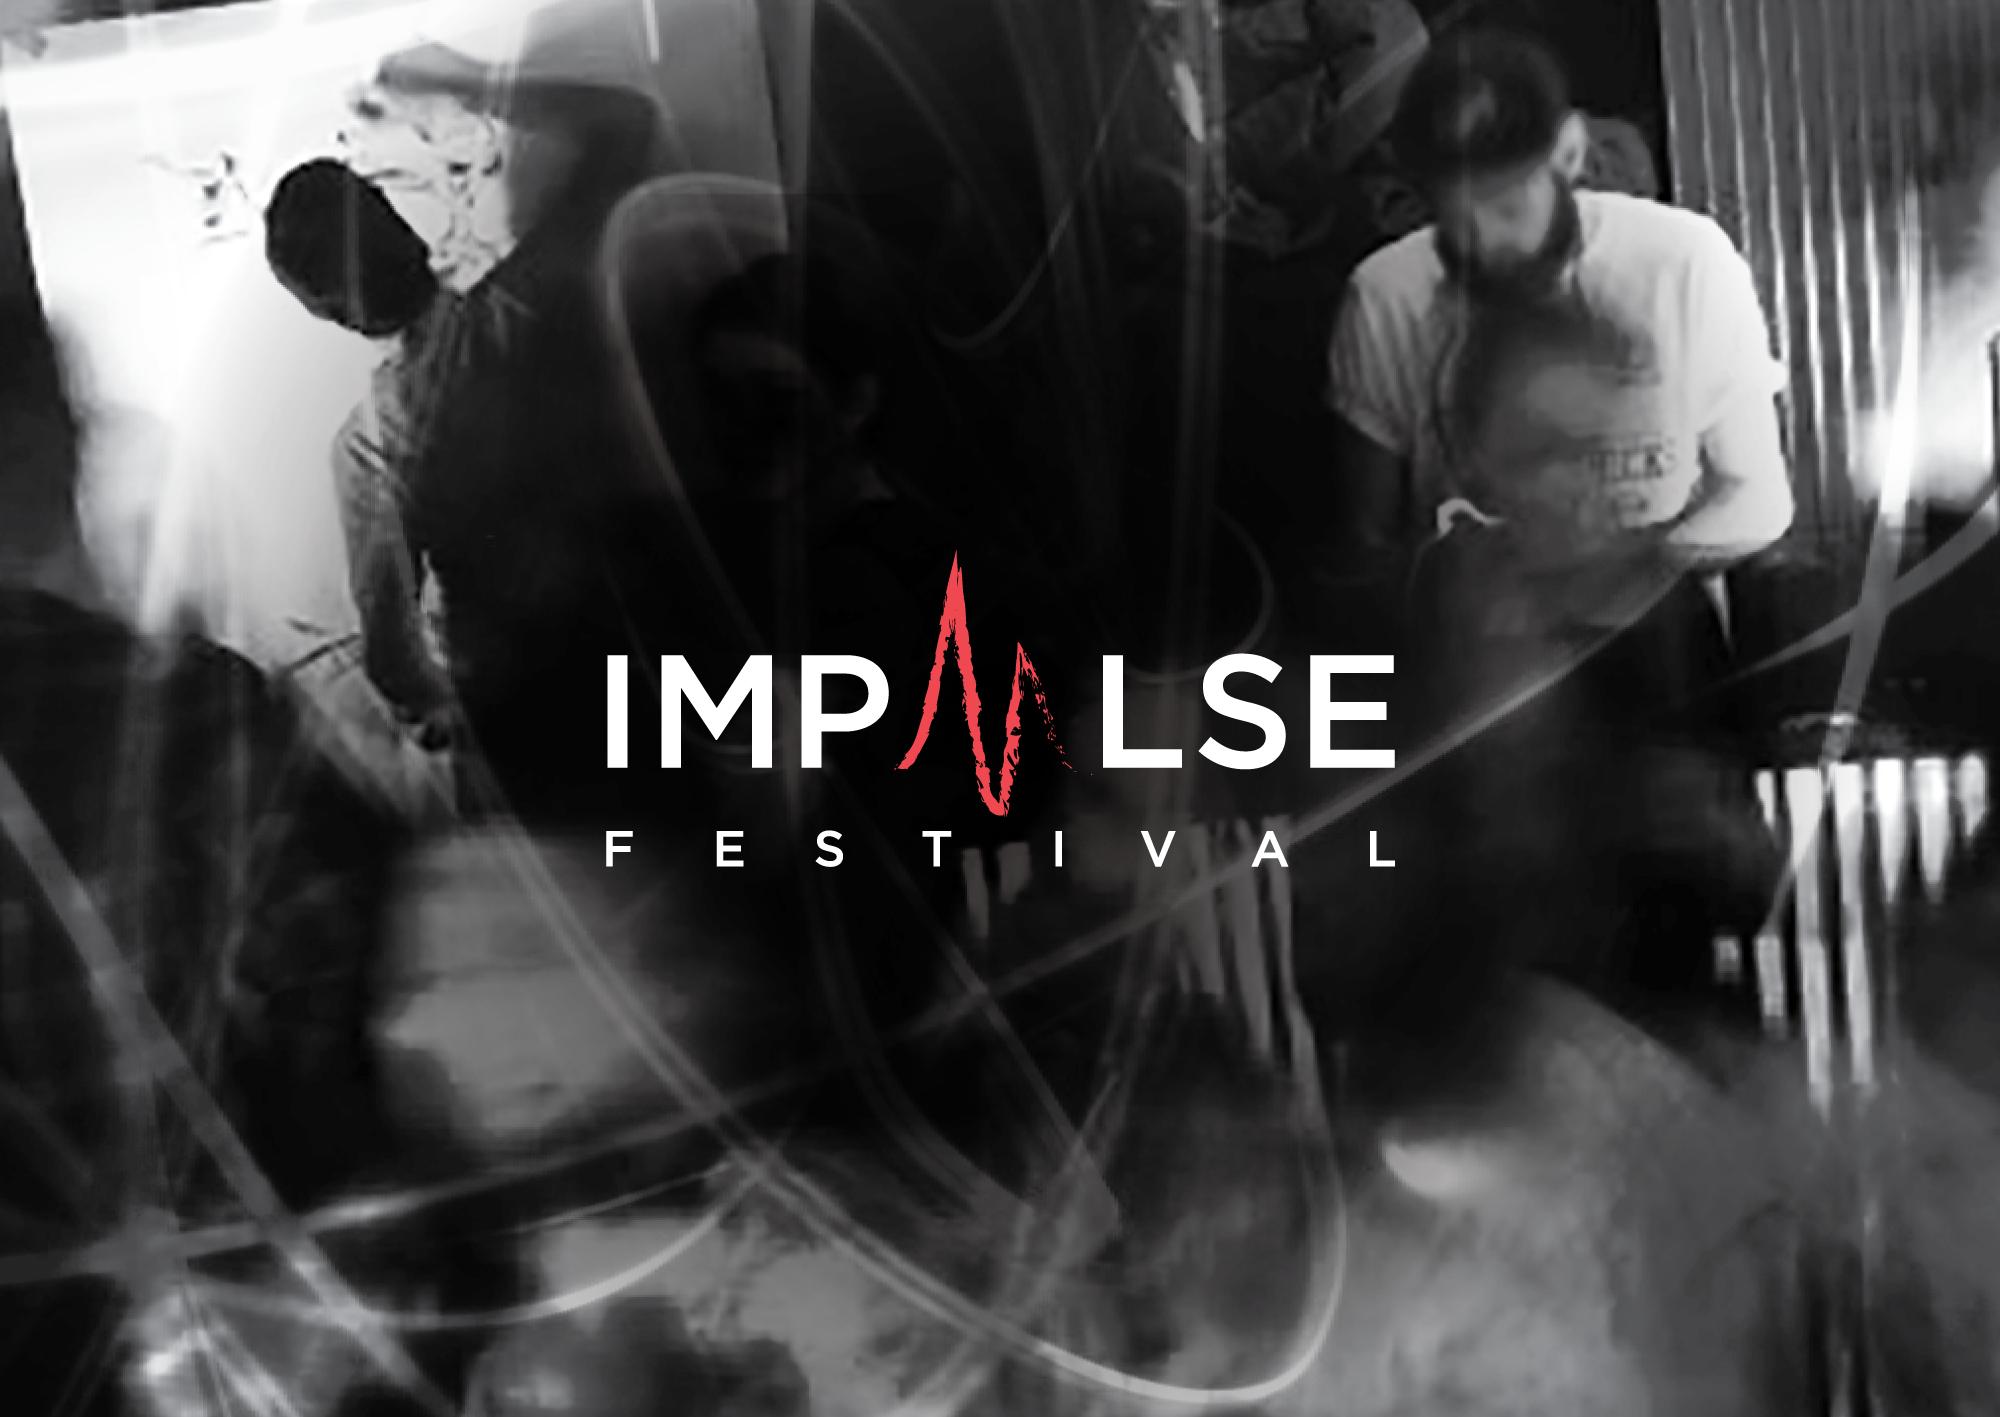 impulse_club_image-13.png